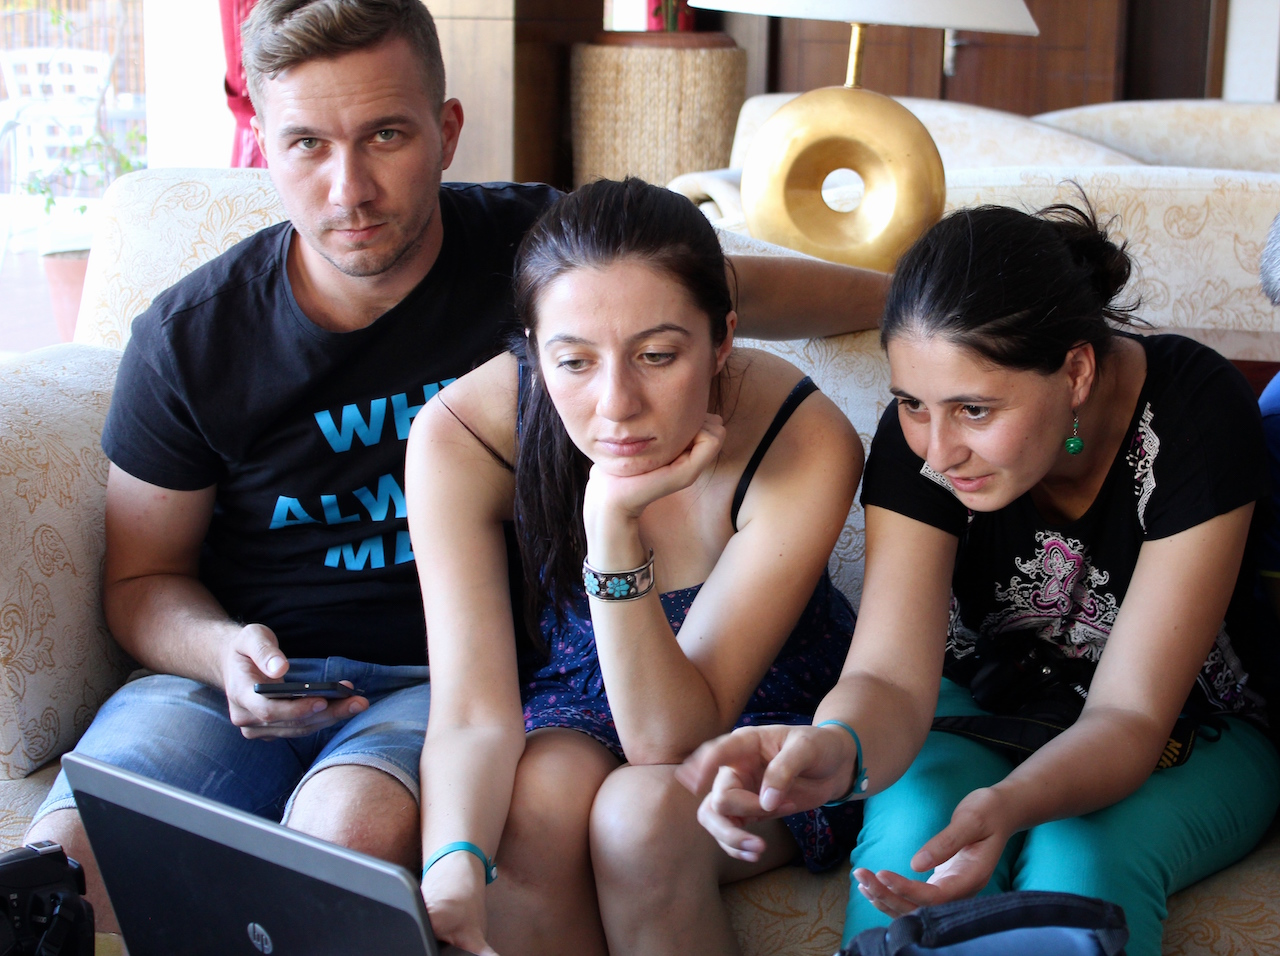 Toimittajat Teymur Maksutov (vas), Toma Sayer ja Aynura Aliyeva